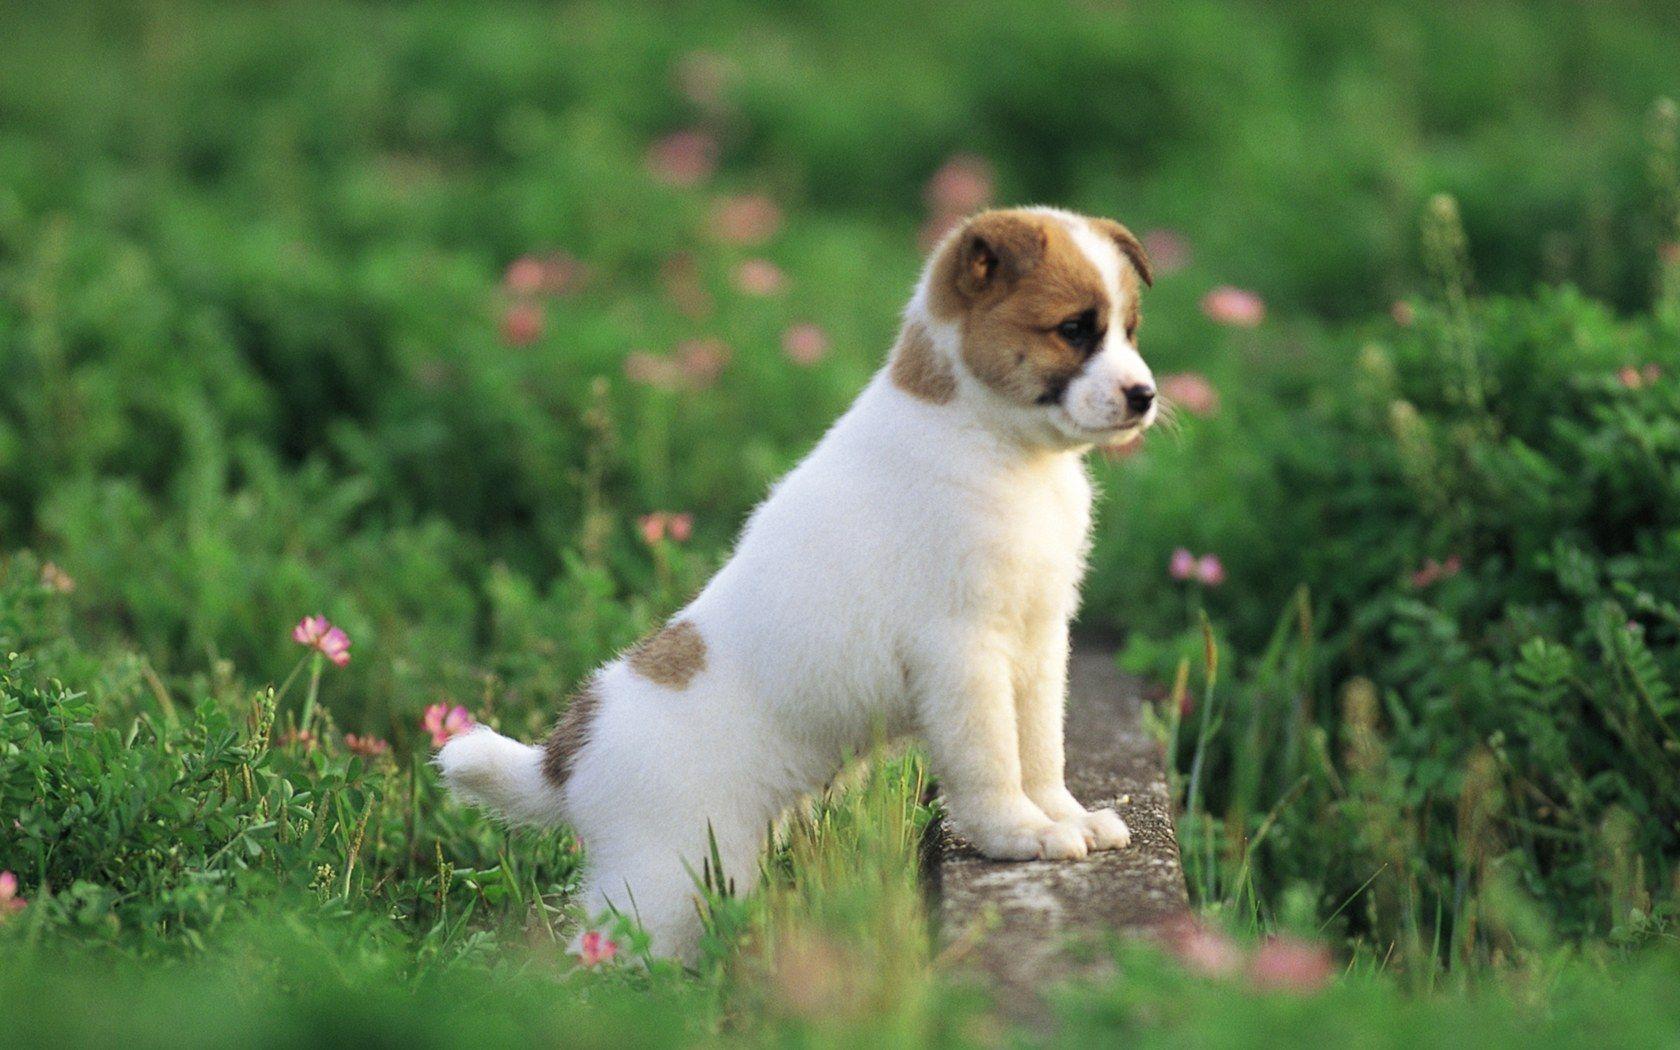 high resolution Cute Puppy In A Park Puppy Dog Grass